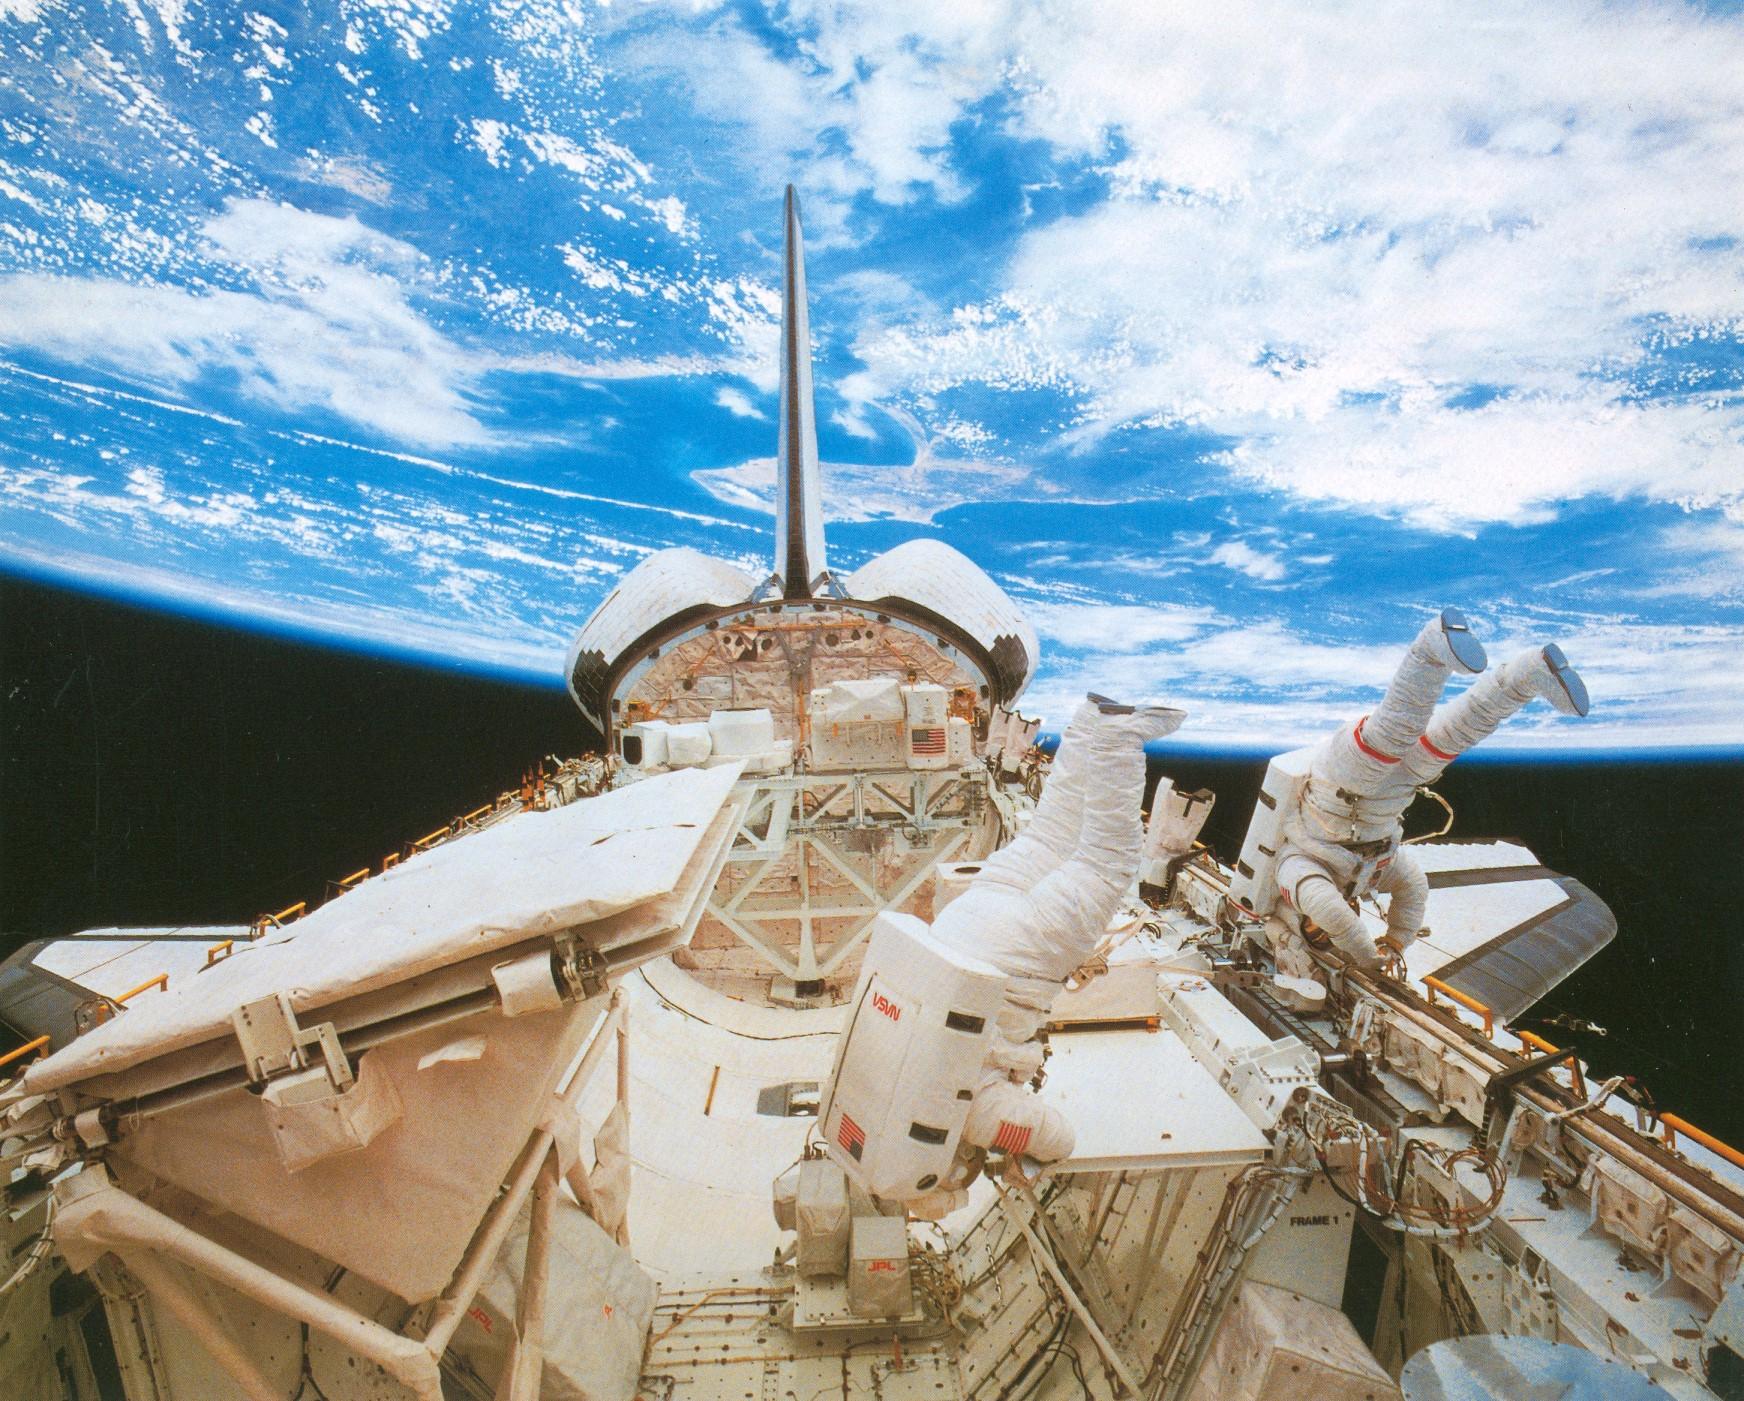 Challenger flight 41g 10 5 1984.jpg